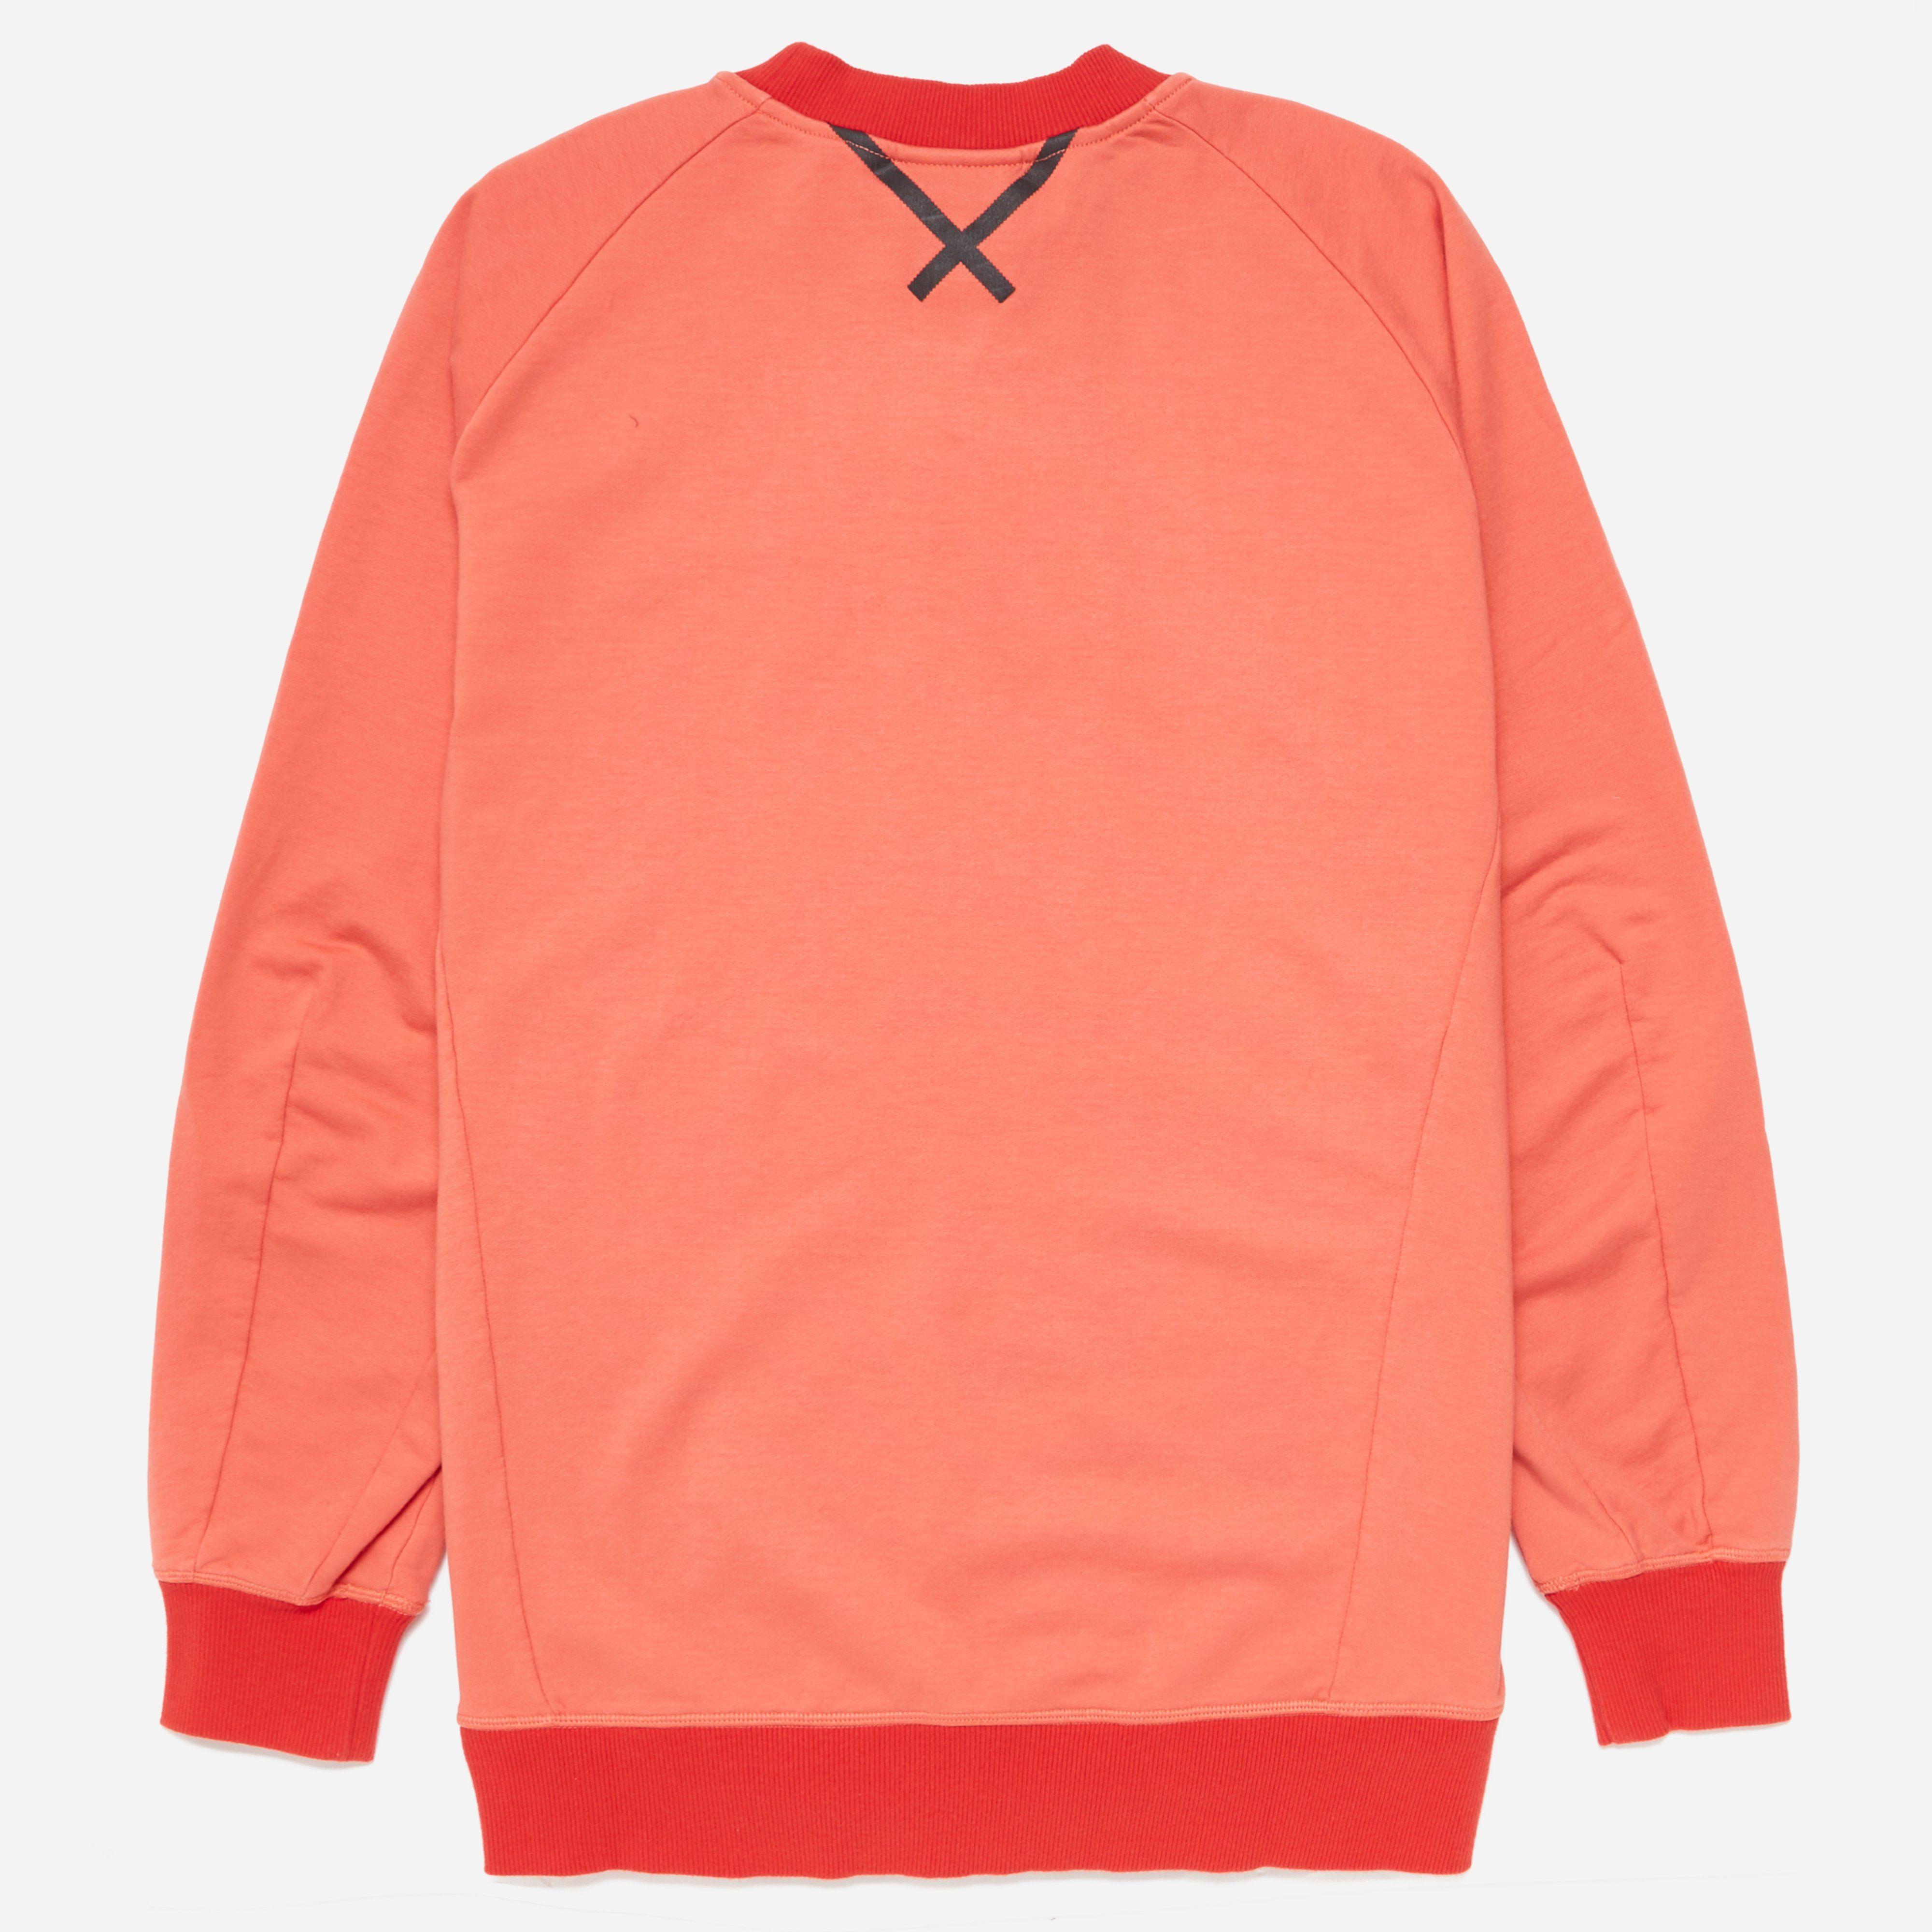 adidas Originals x Oyster Holdings XBYO Crew Sweatshirt